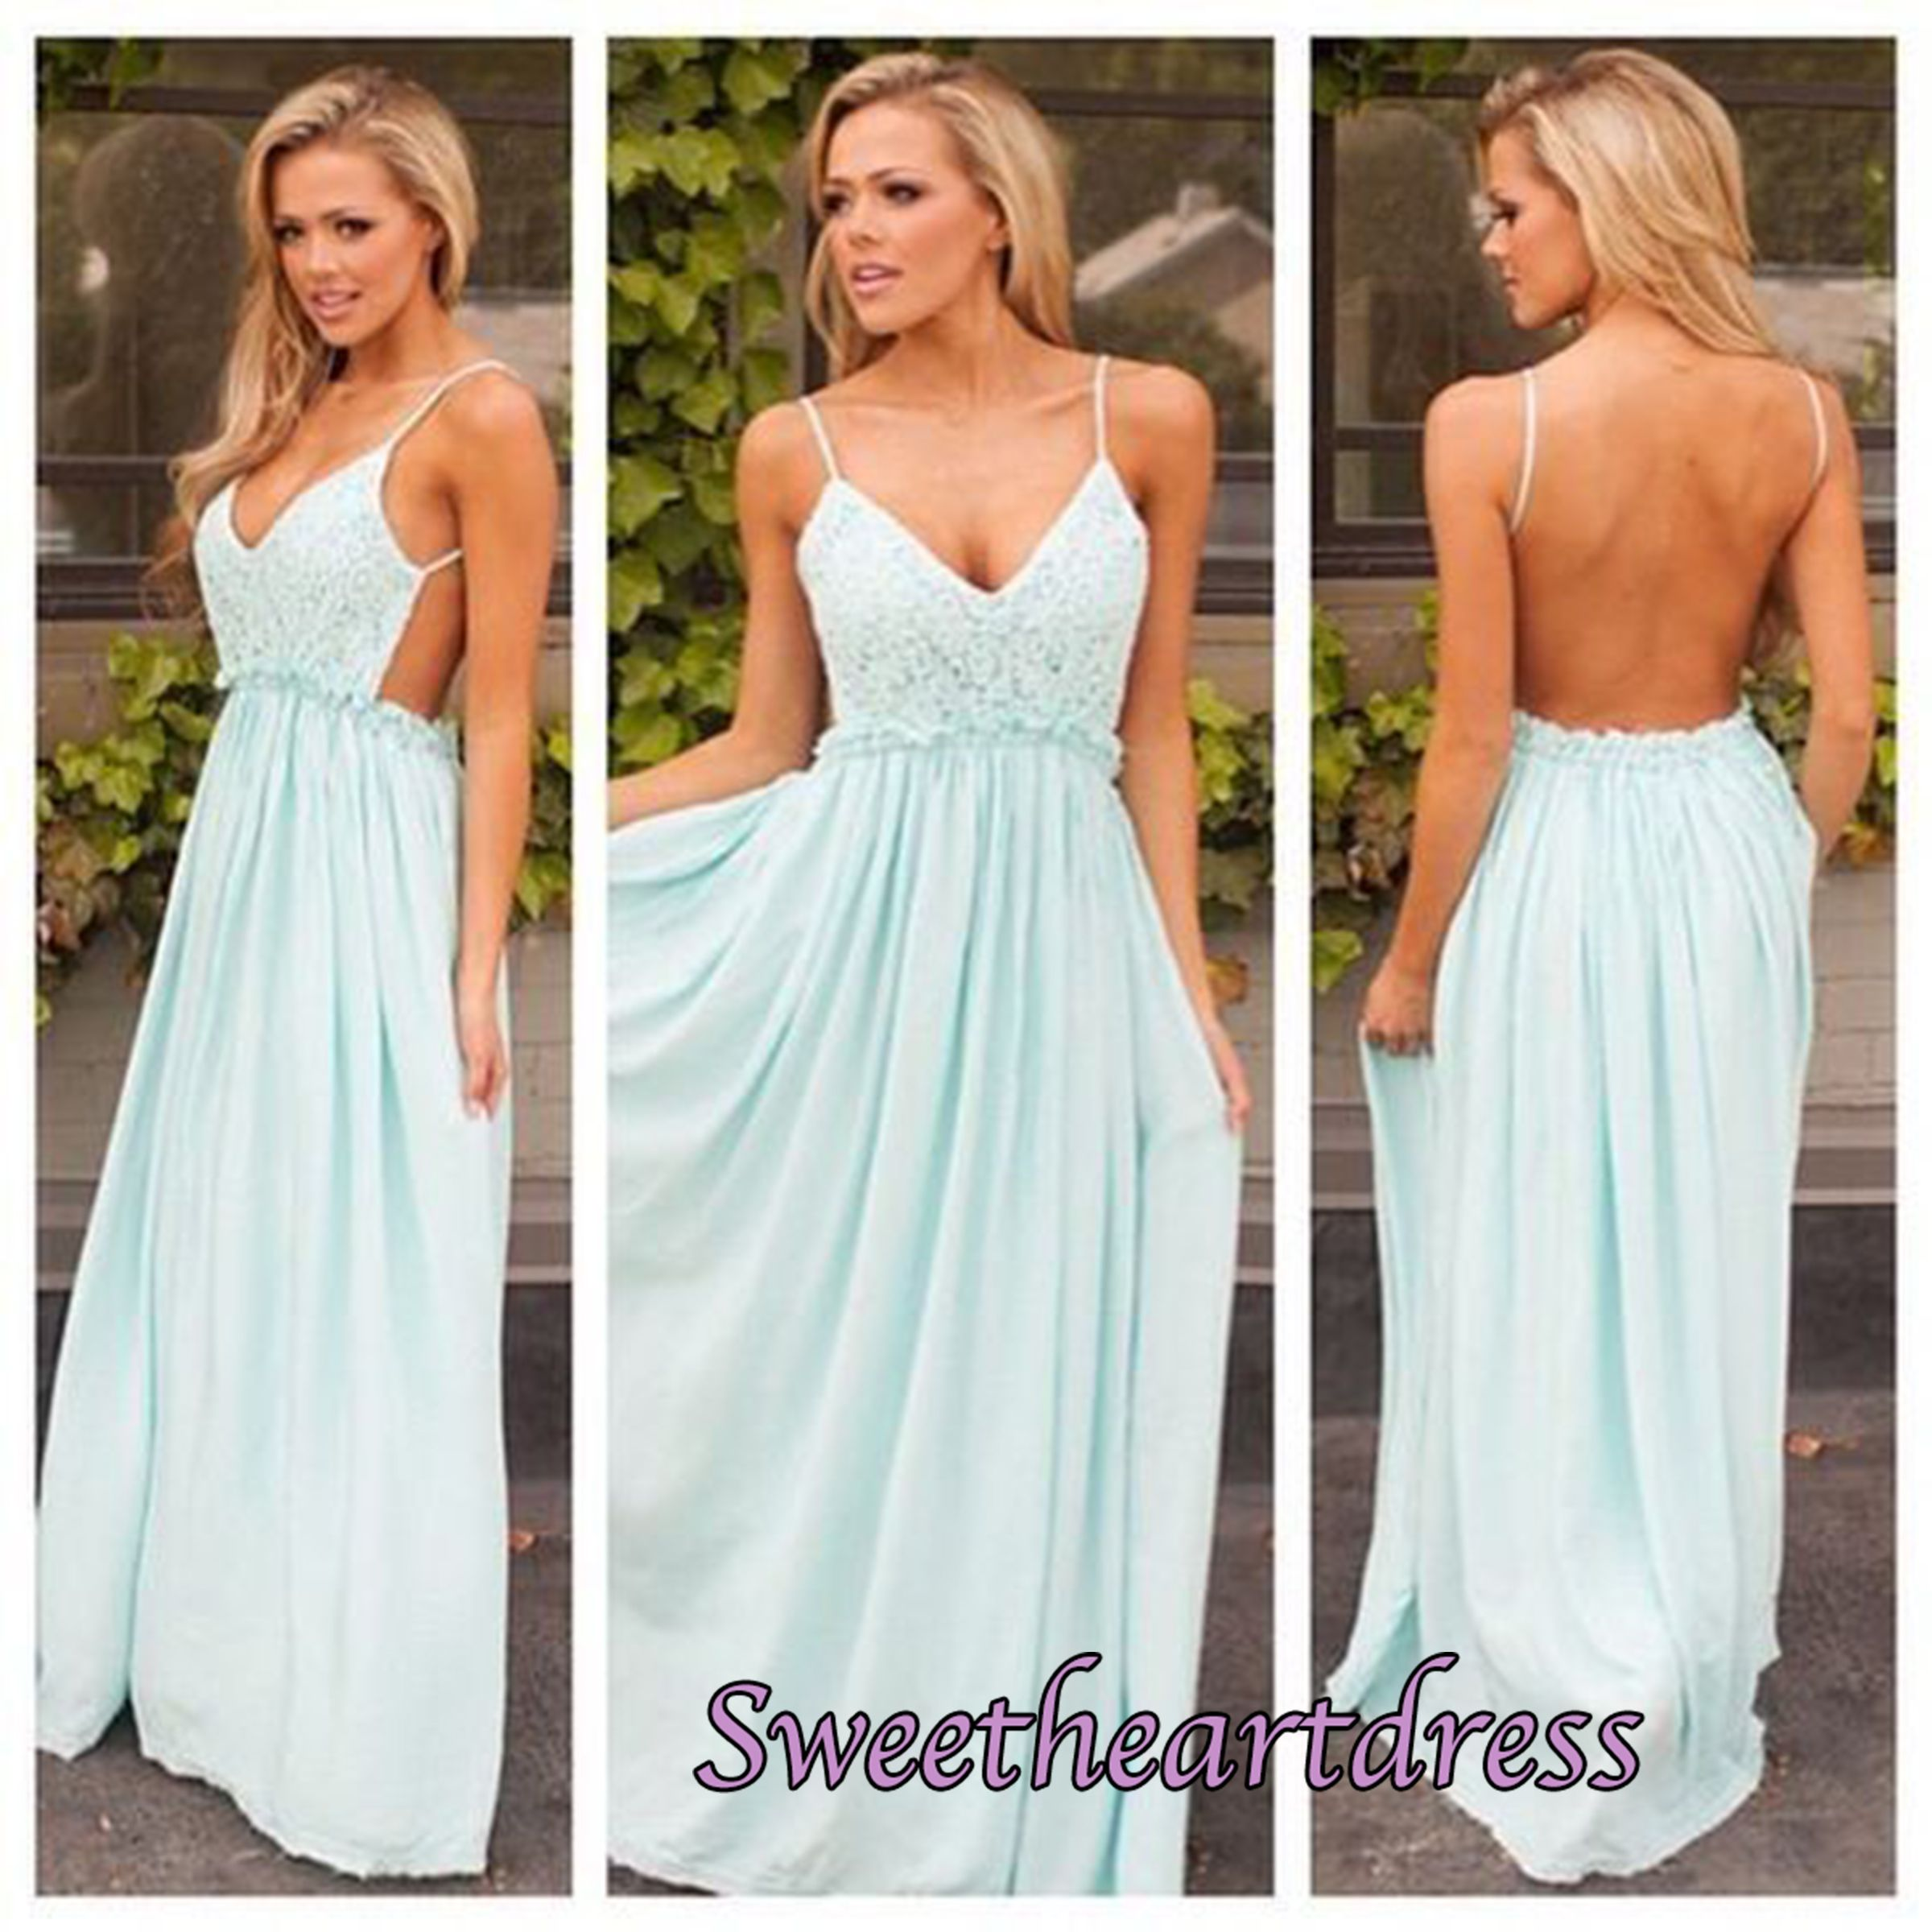 Blue Spaghetti Strap Prom Dresses